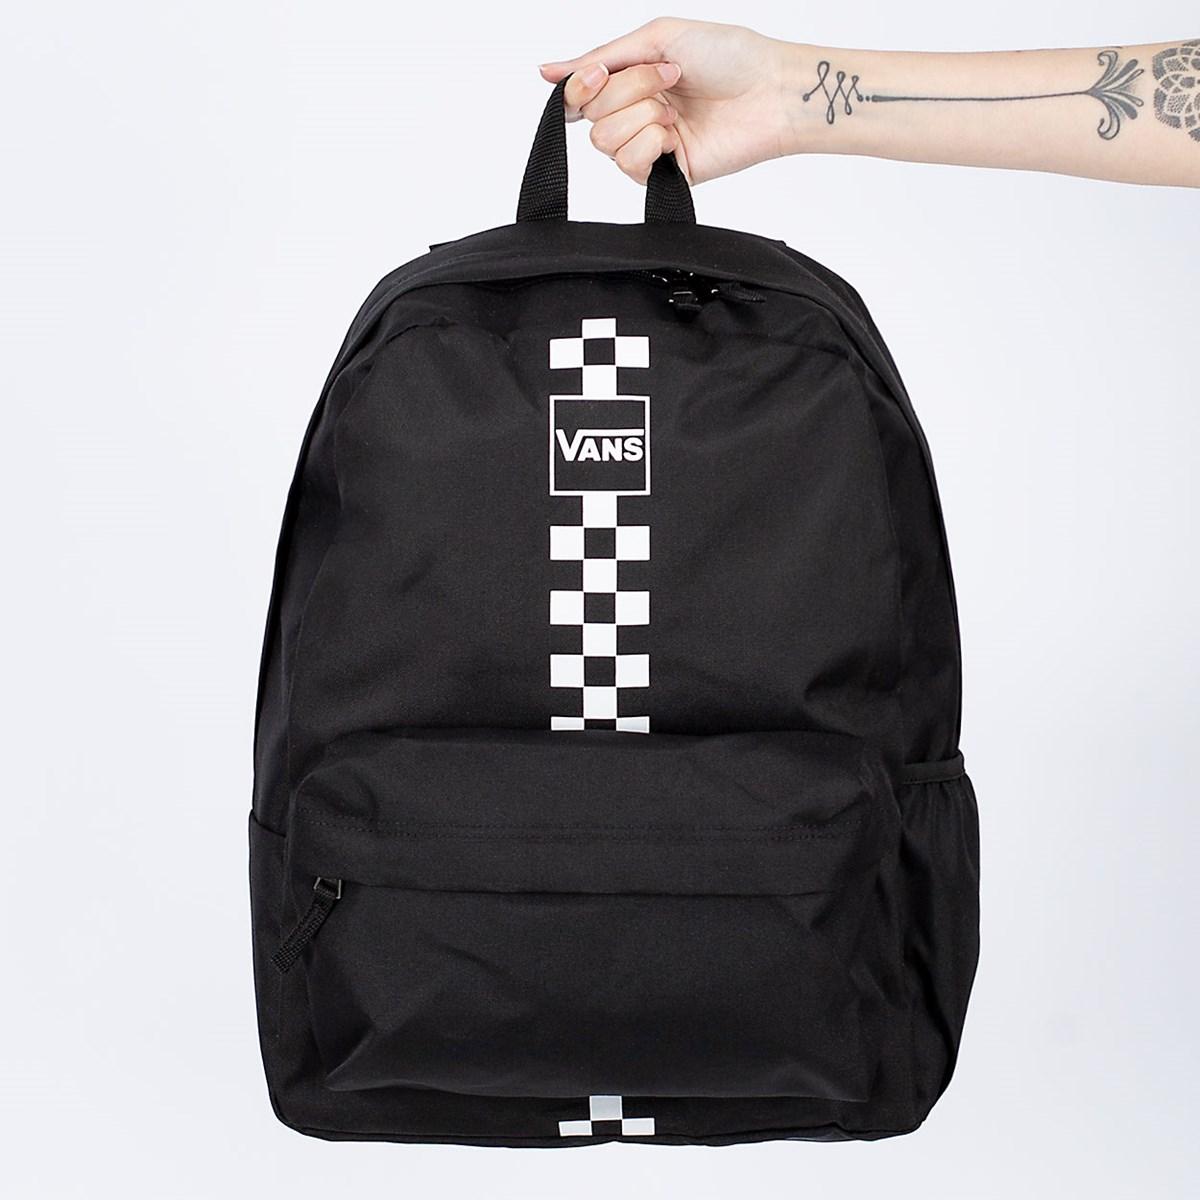 Mochila Vans Street Sport Realm Backpack Black VN0A49ZJZFO